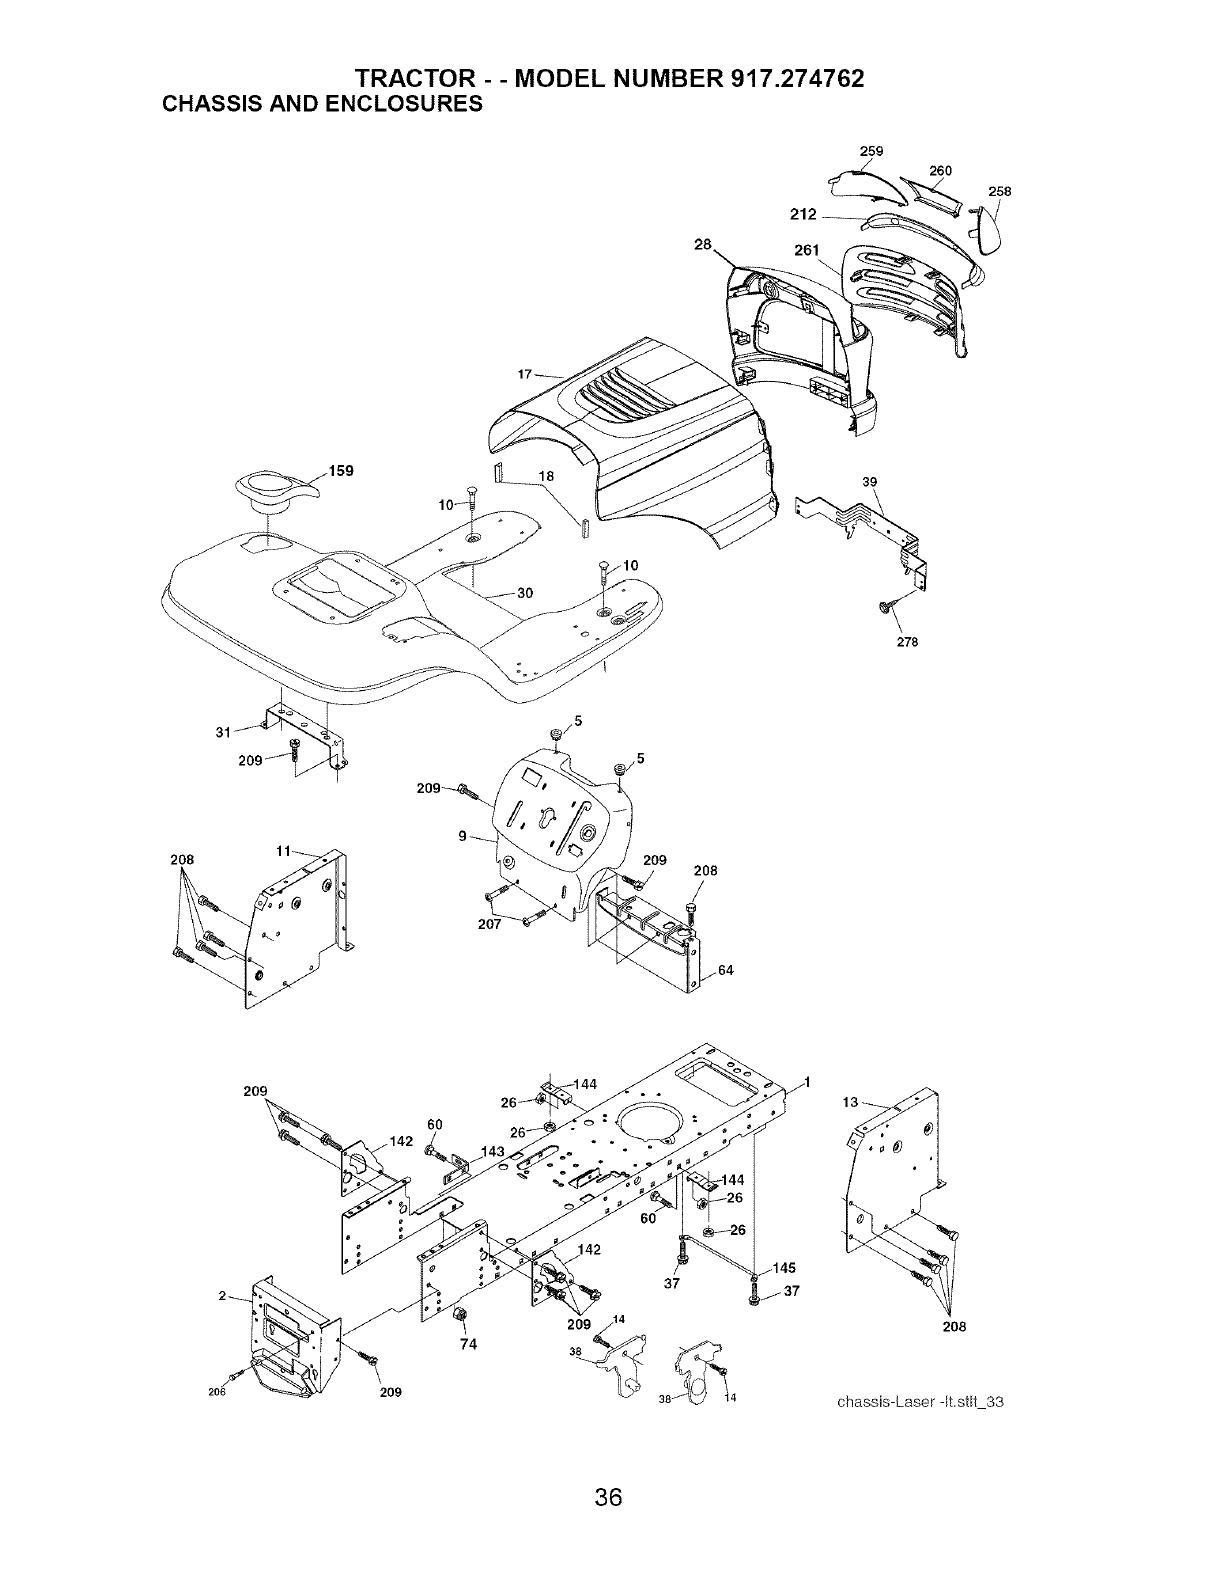 Craftsman 917 274762 Users Manual